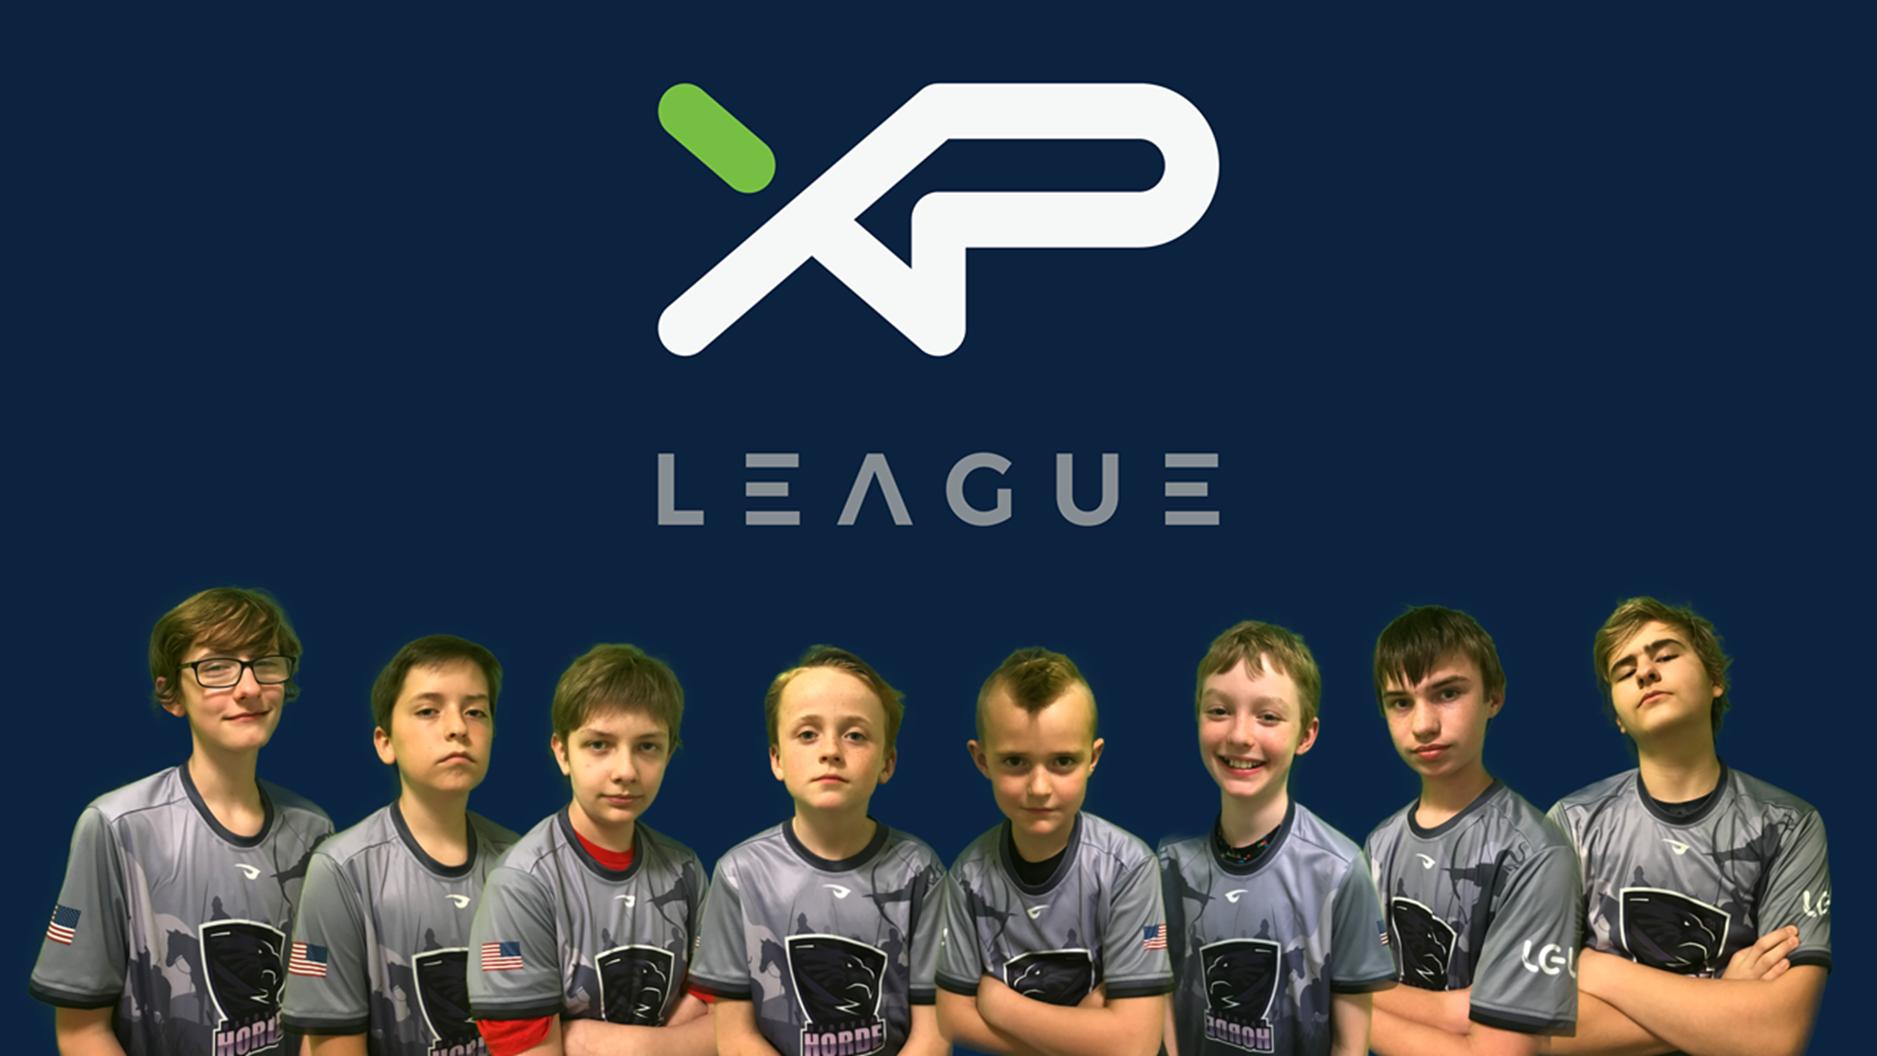 Background XP League Hanover